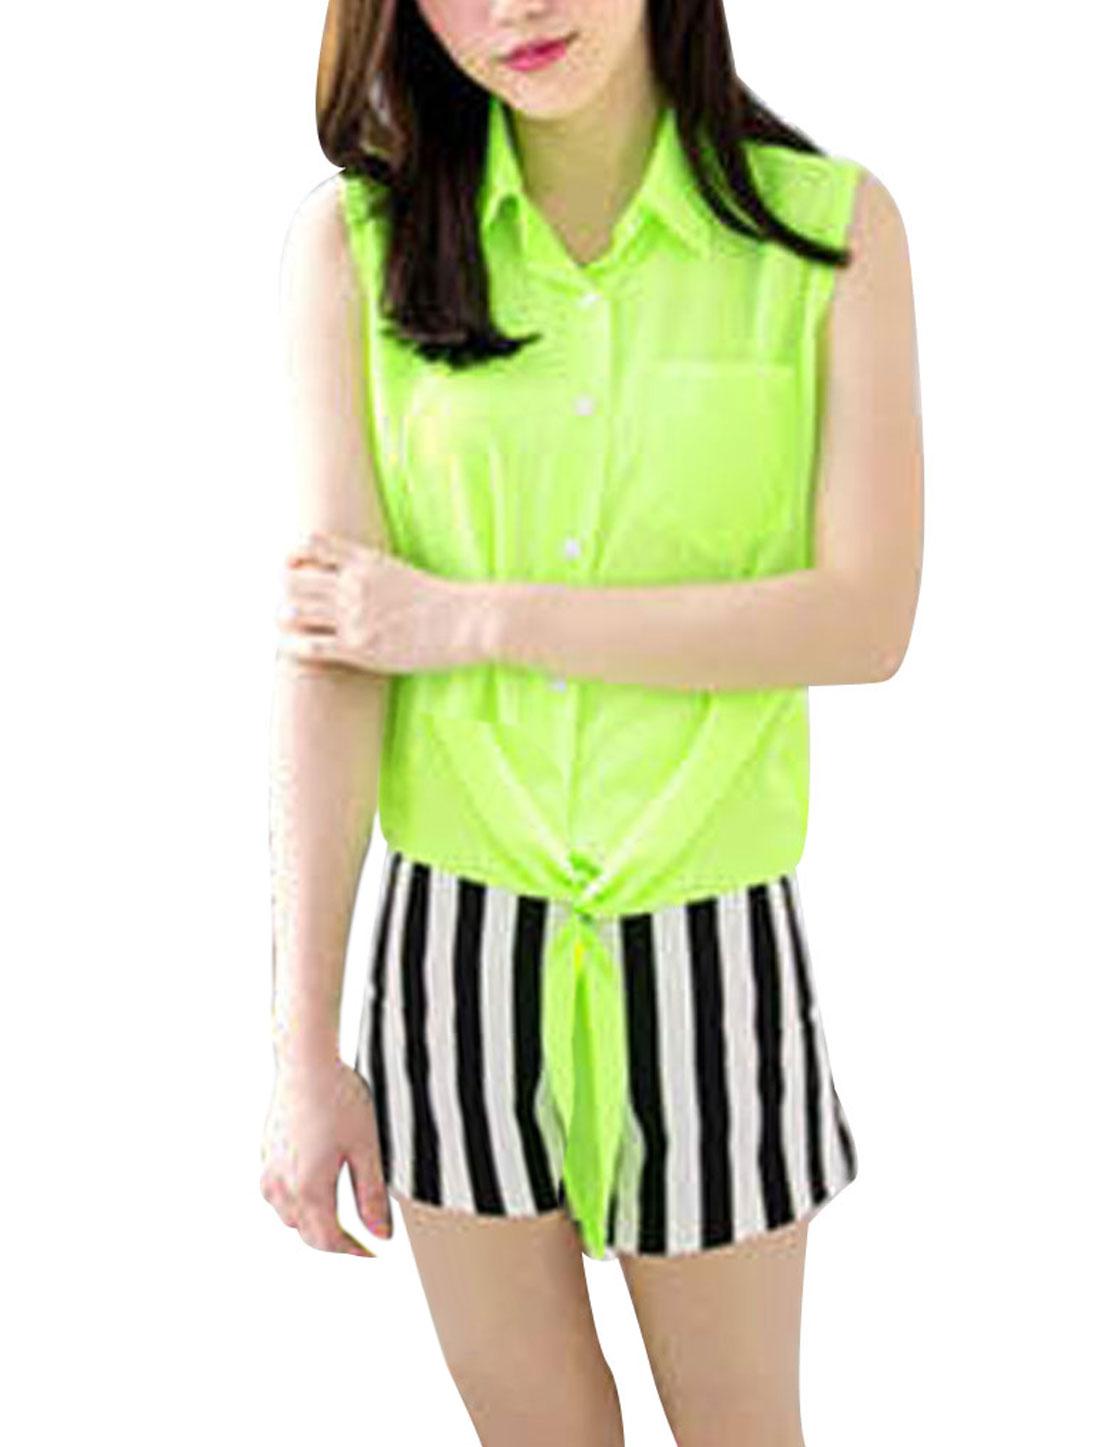 Ladies Point Collar Self Tie Hem Button Up Sleeveless Shirt Lime XS